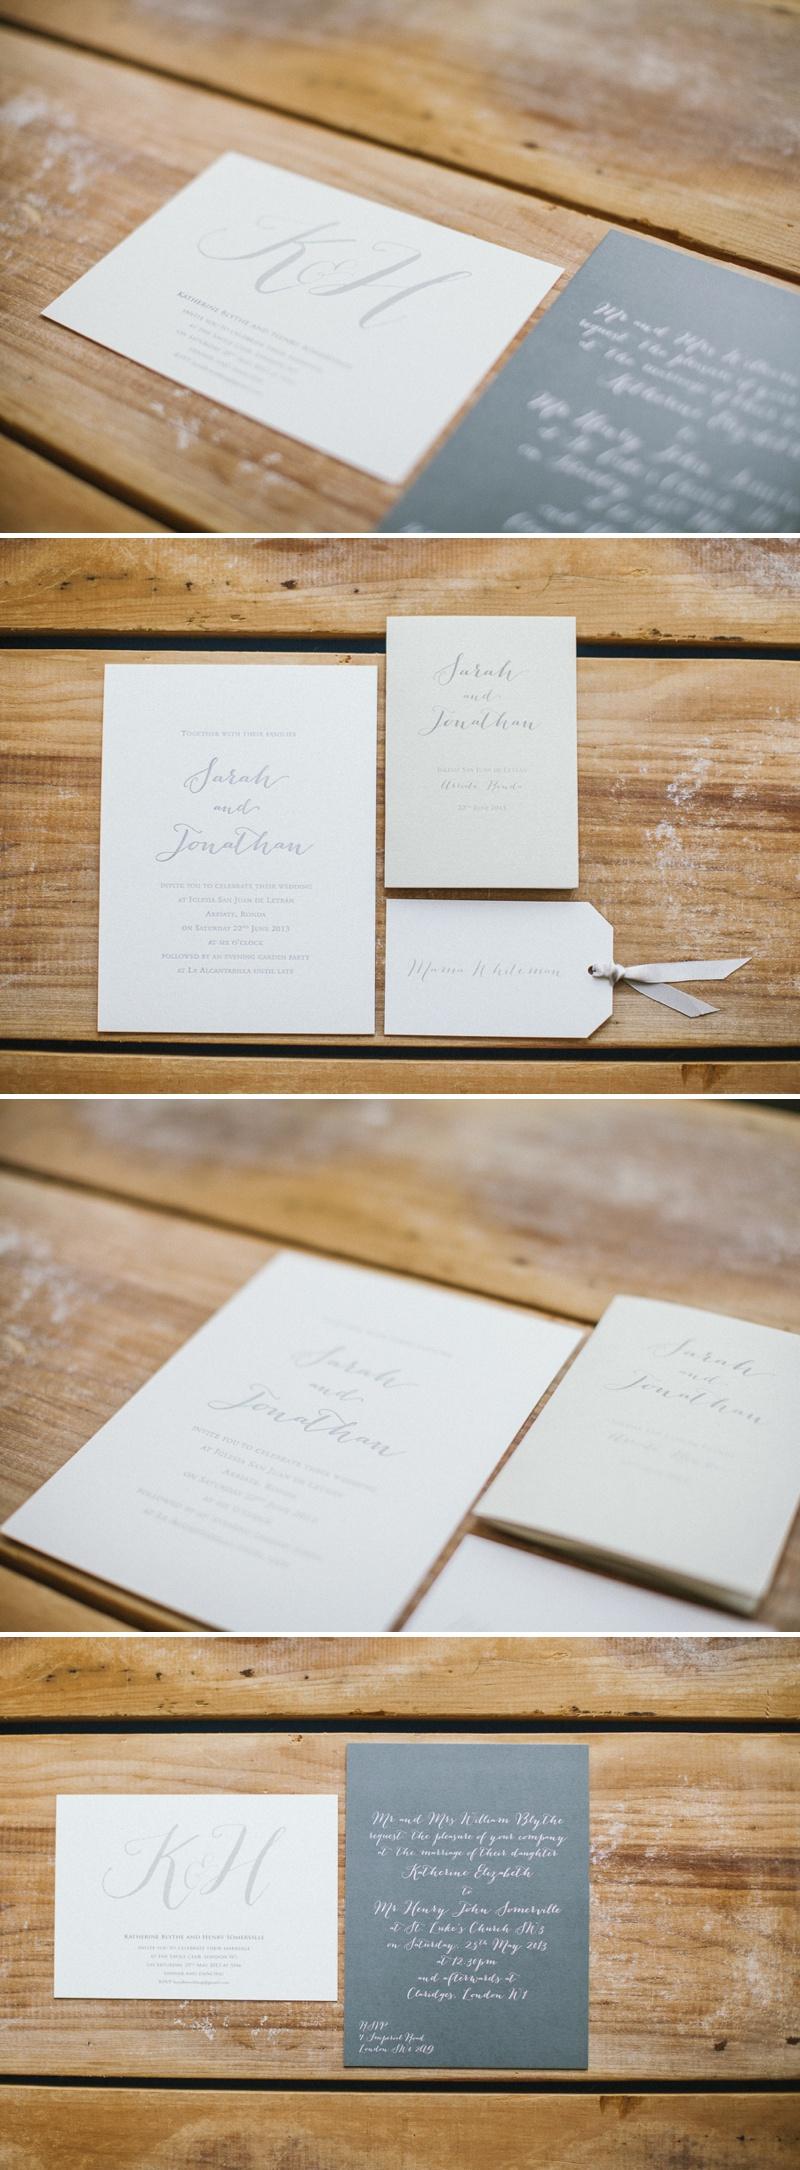 CLD Stationery Letterpressed Grey and Cream Colour Scheme Wedding Invitation